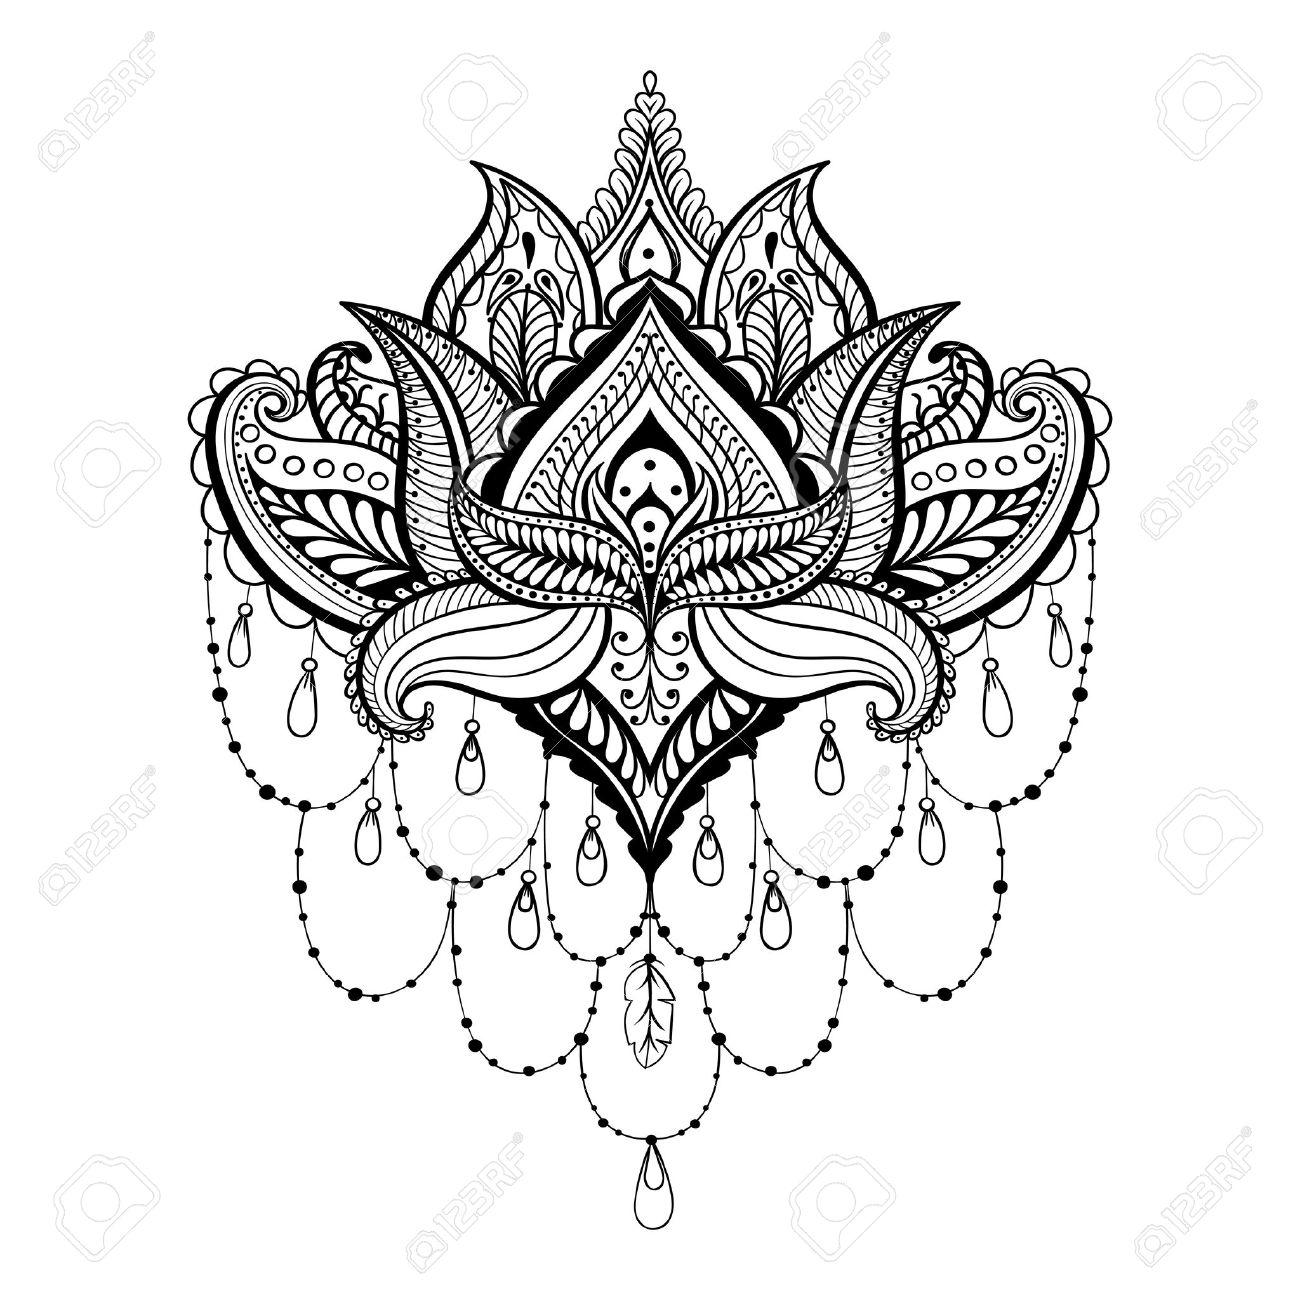 Coloriage Anti Stress Indien.Vector Ornement Lotus Ethnique Zentangled Tatouage Au Henne Paisley Indienne Motifs Pour Anti Stress Coloriage Adultes Illustration Main Dessine